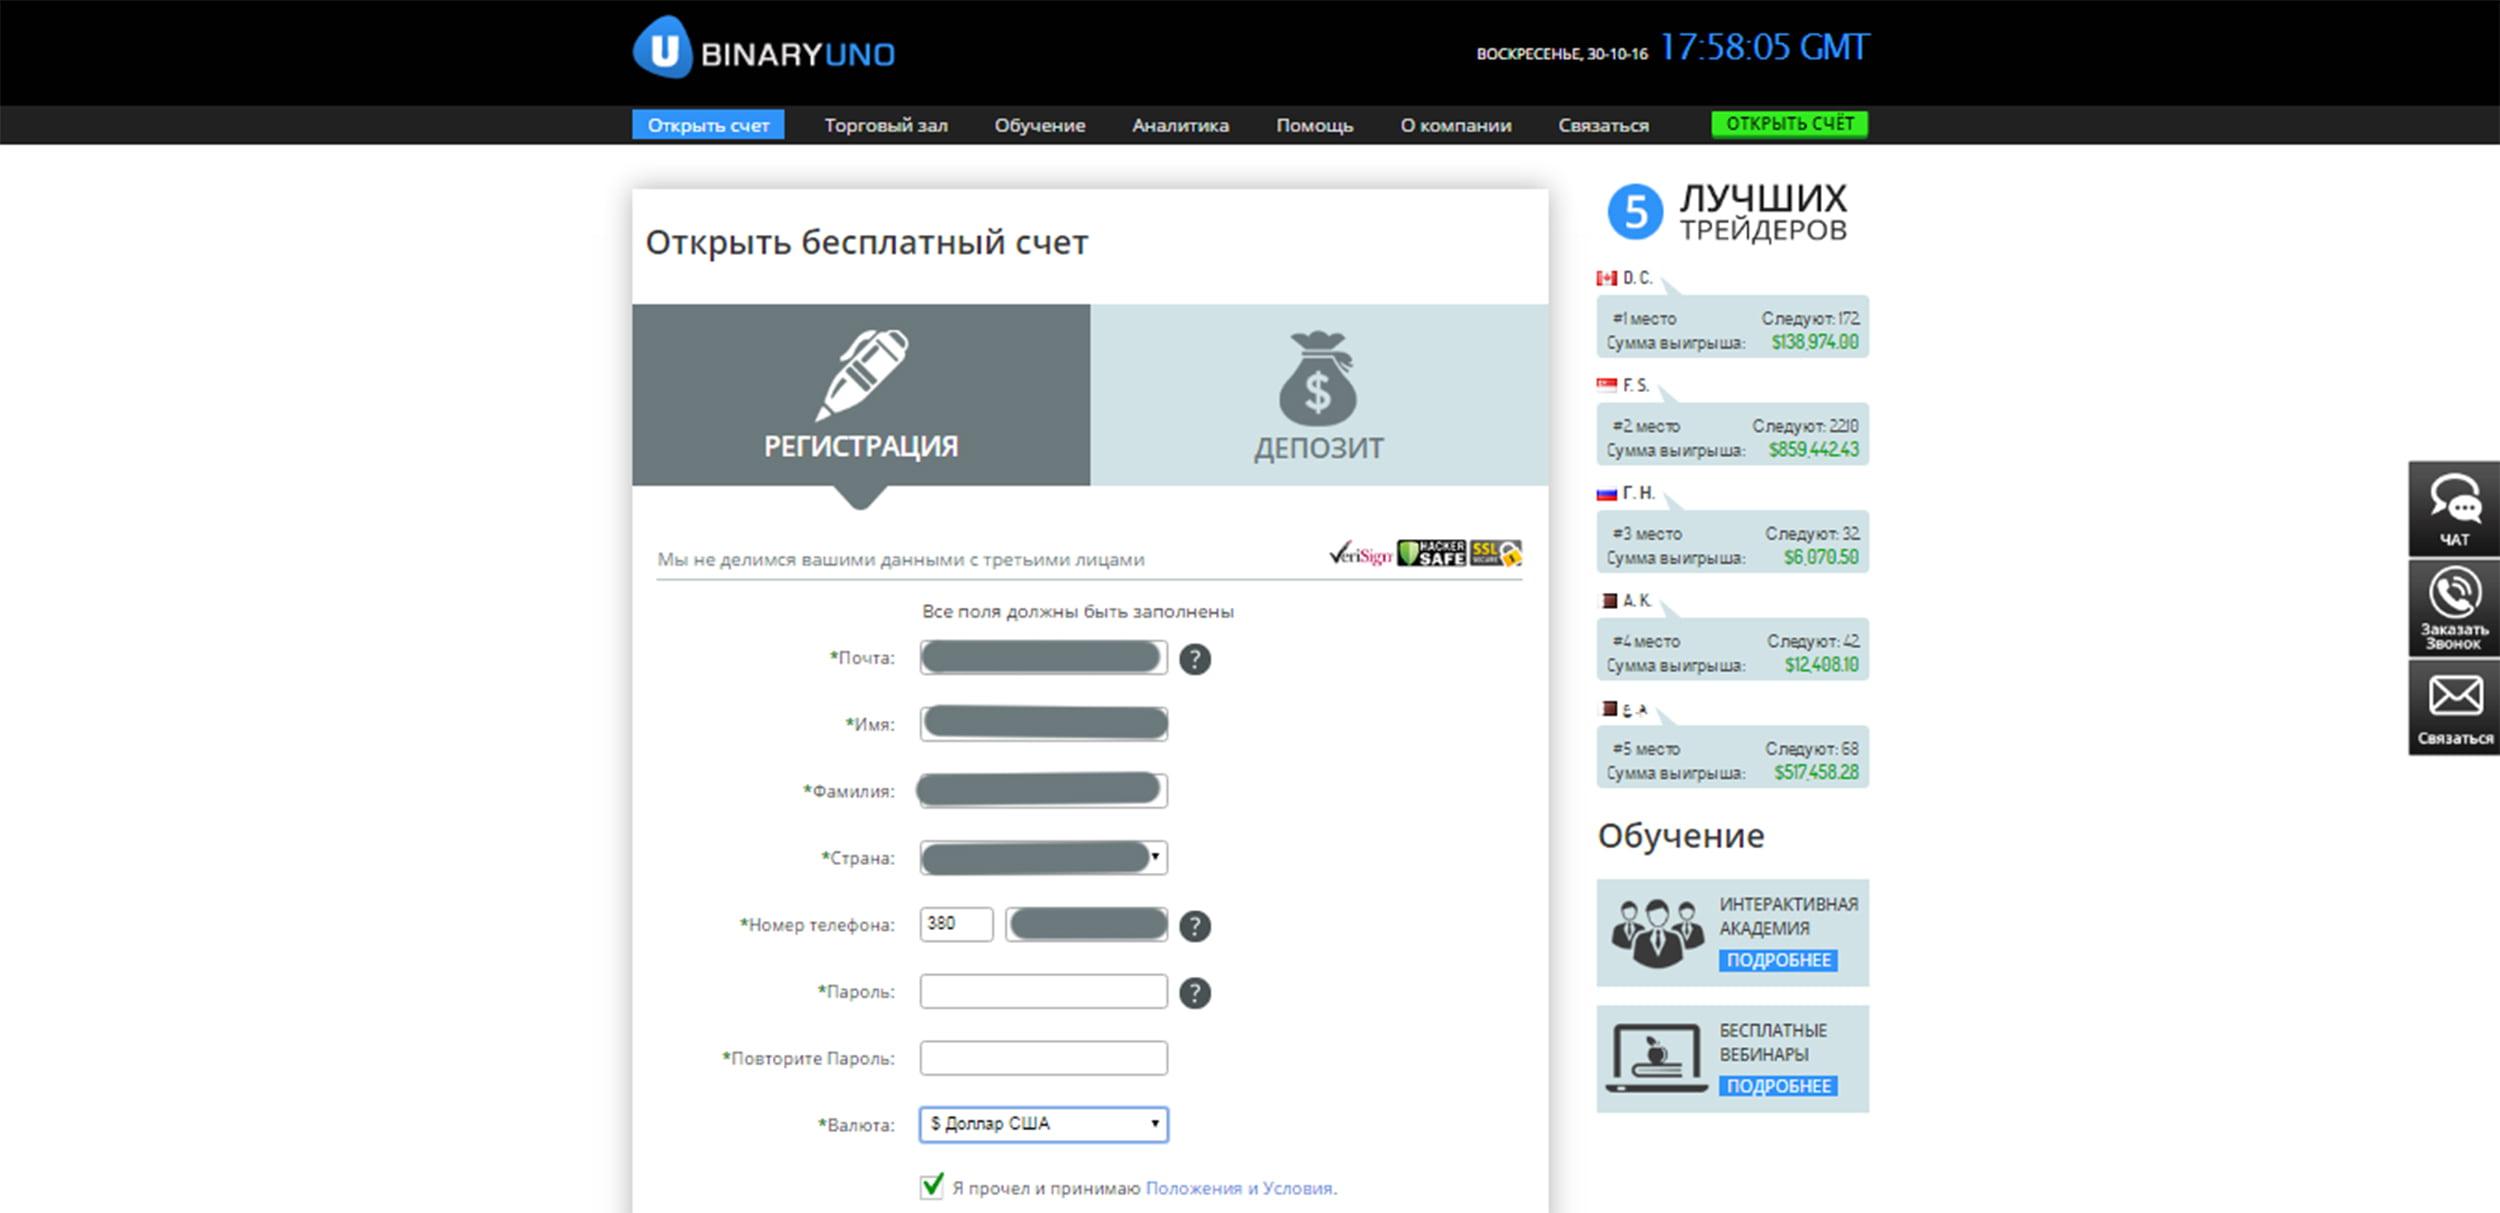 Регистрация у брокера BinaryUno